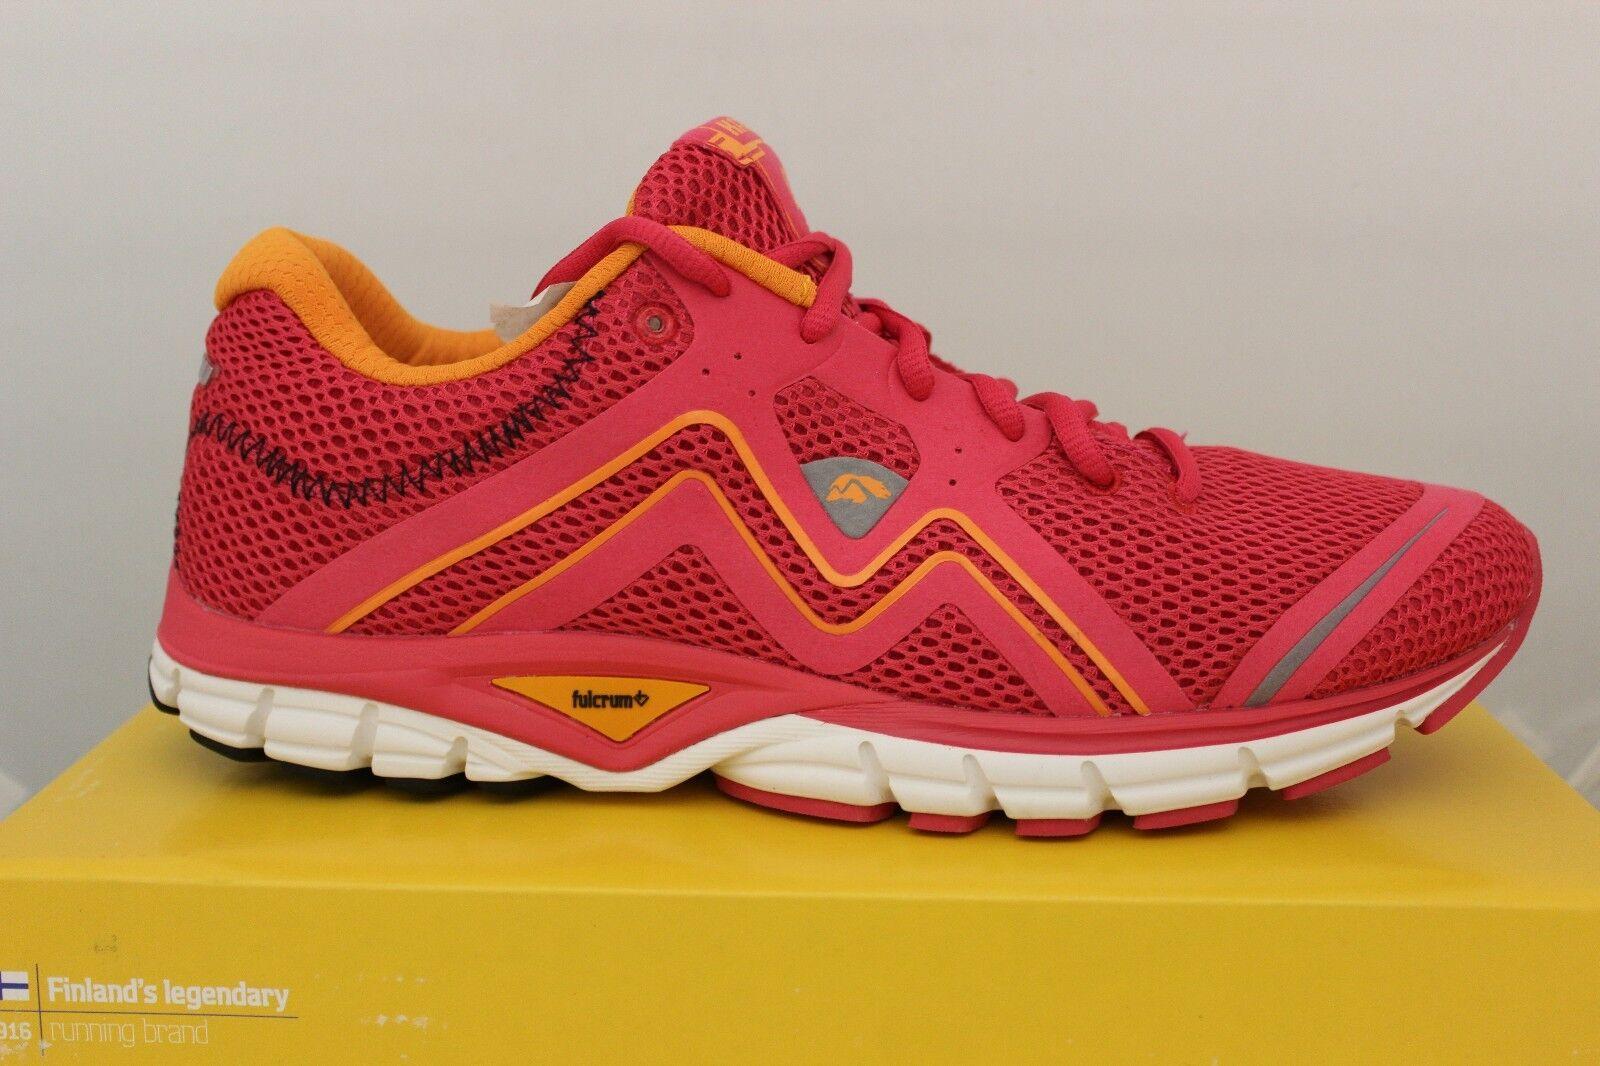 Women's Karhu Fluid3 Running Shoes Hibiscus/Tiger F200121 Brand New